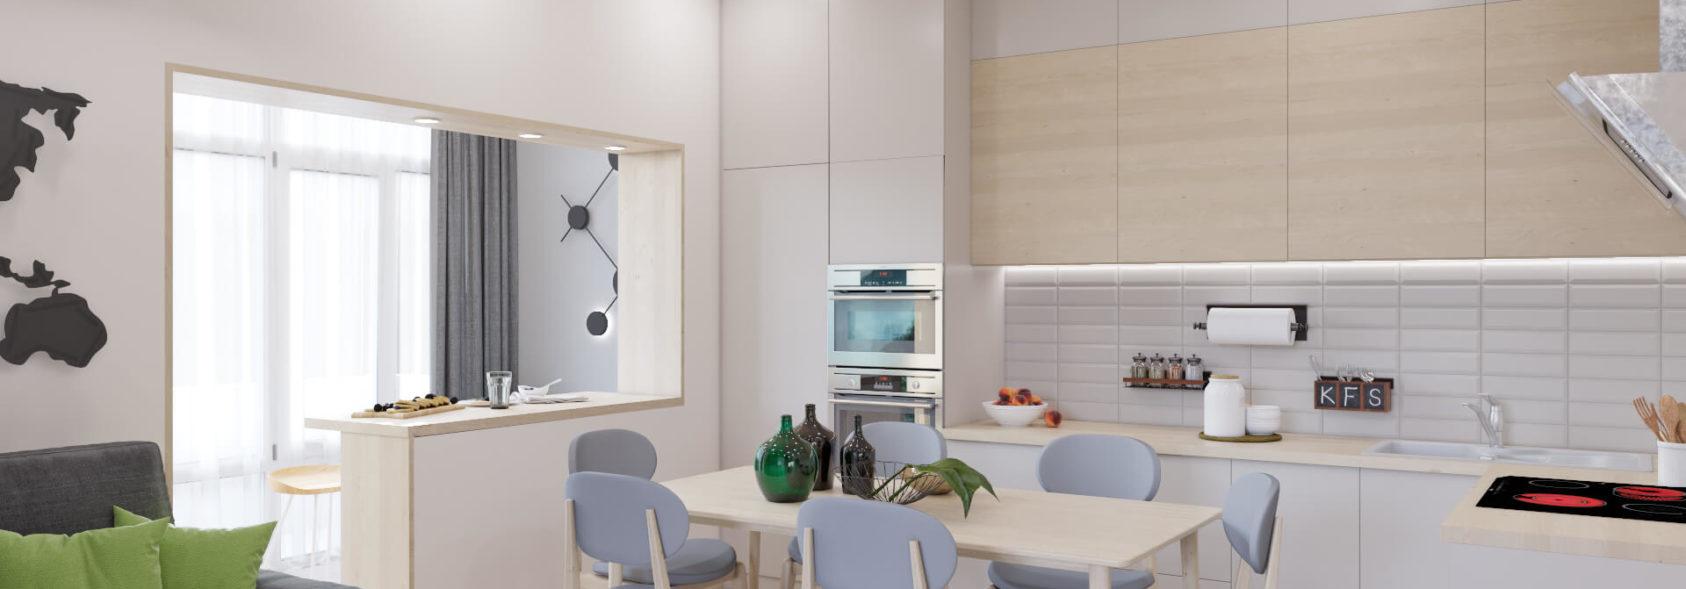 Дизайн 3х комнатной квартиры Запорожье кухня